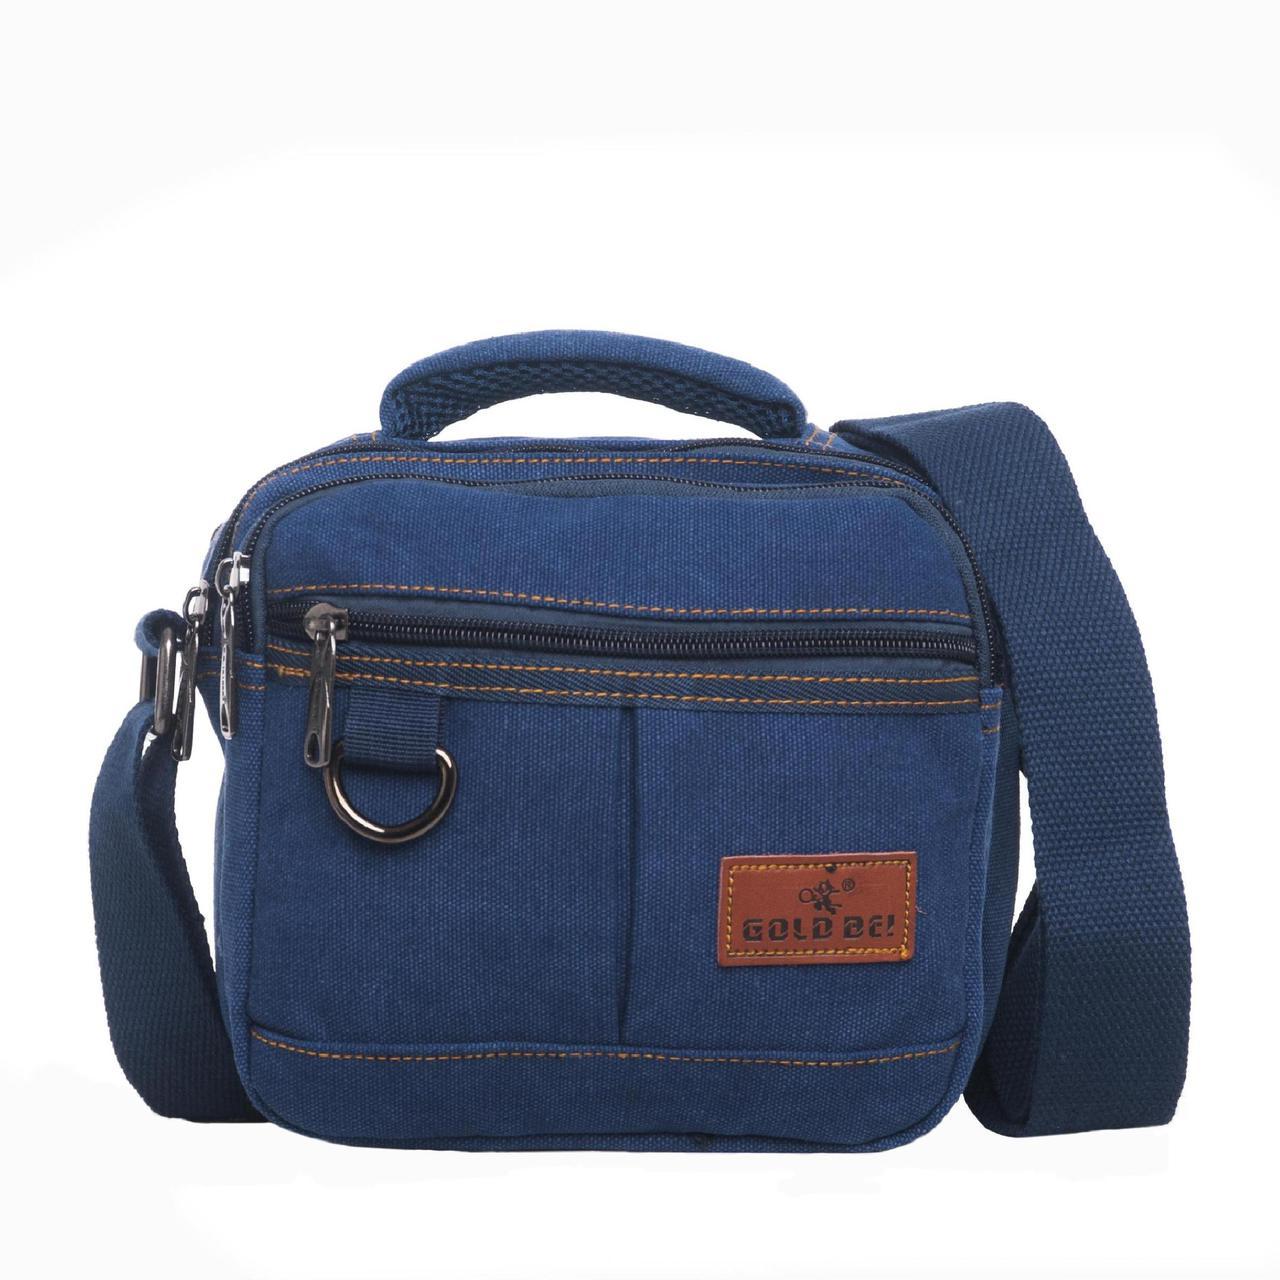 Мужская сумка горизонтальная GOLD BE 20х21х12 синяя ткань брезент ксС999син